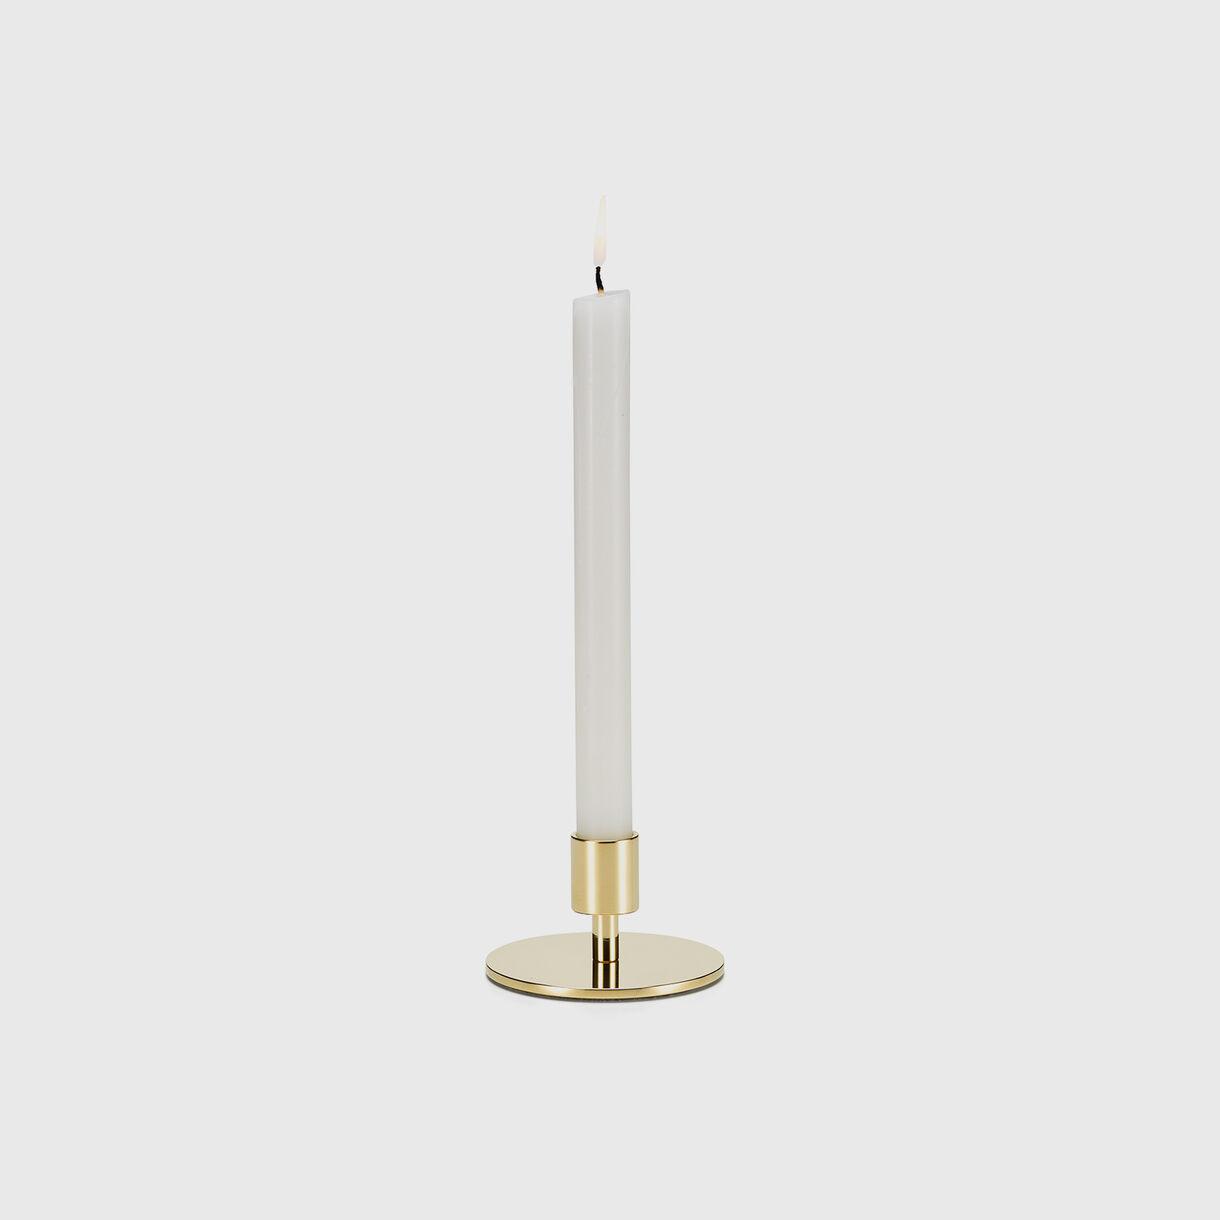 Girard Brass Candle Holder, Circle High